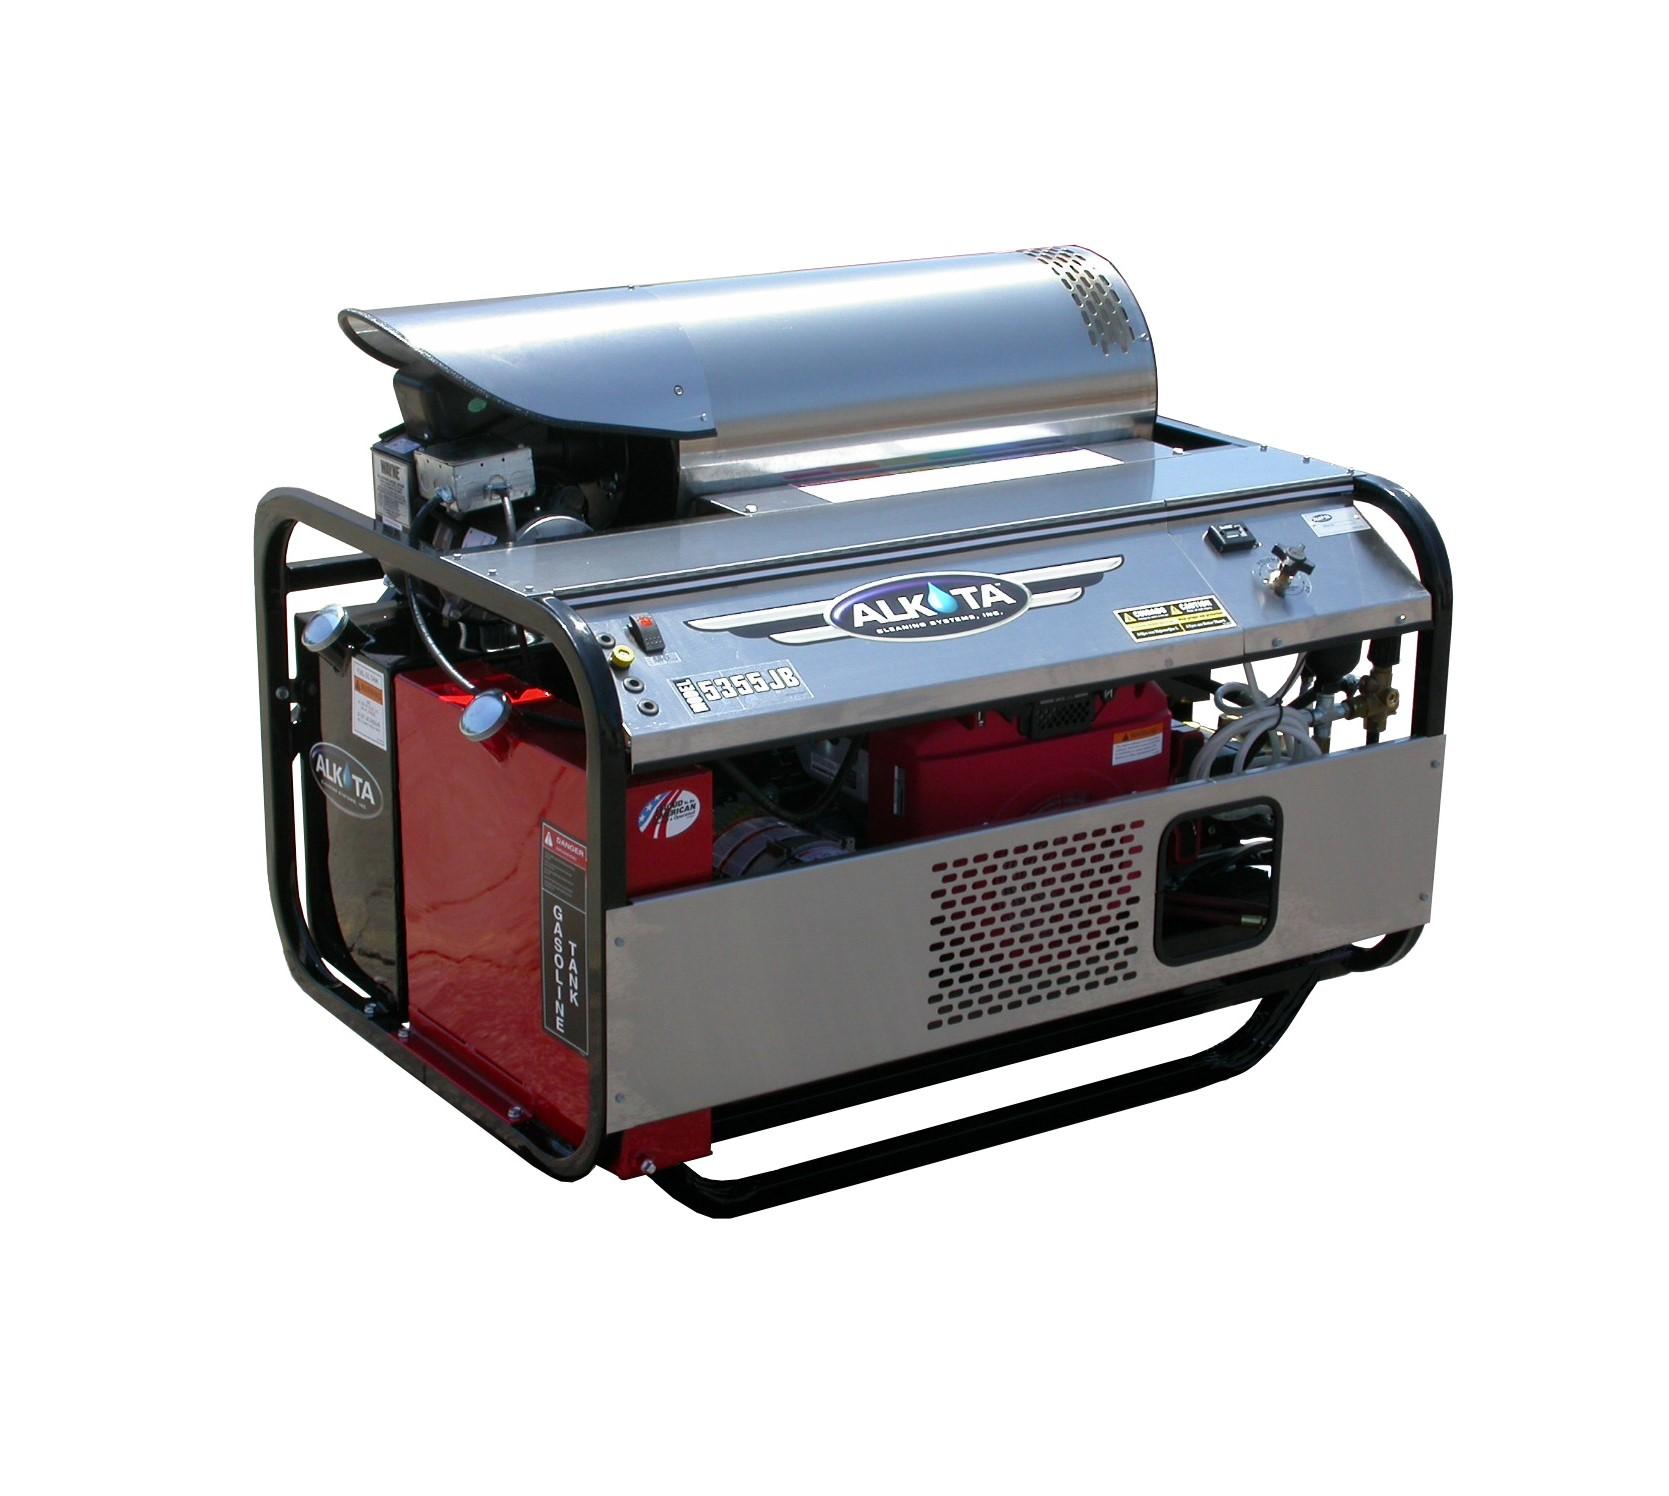 hight resolution of pressure washer hot water gas engine 5355jb alkota alkota cleaningpressure washer hot water gas engine 5355jb